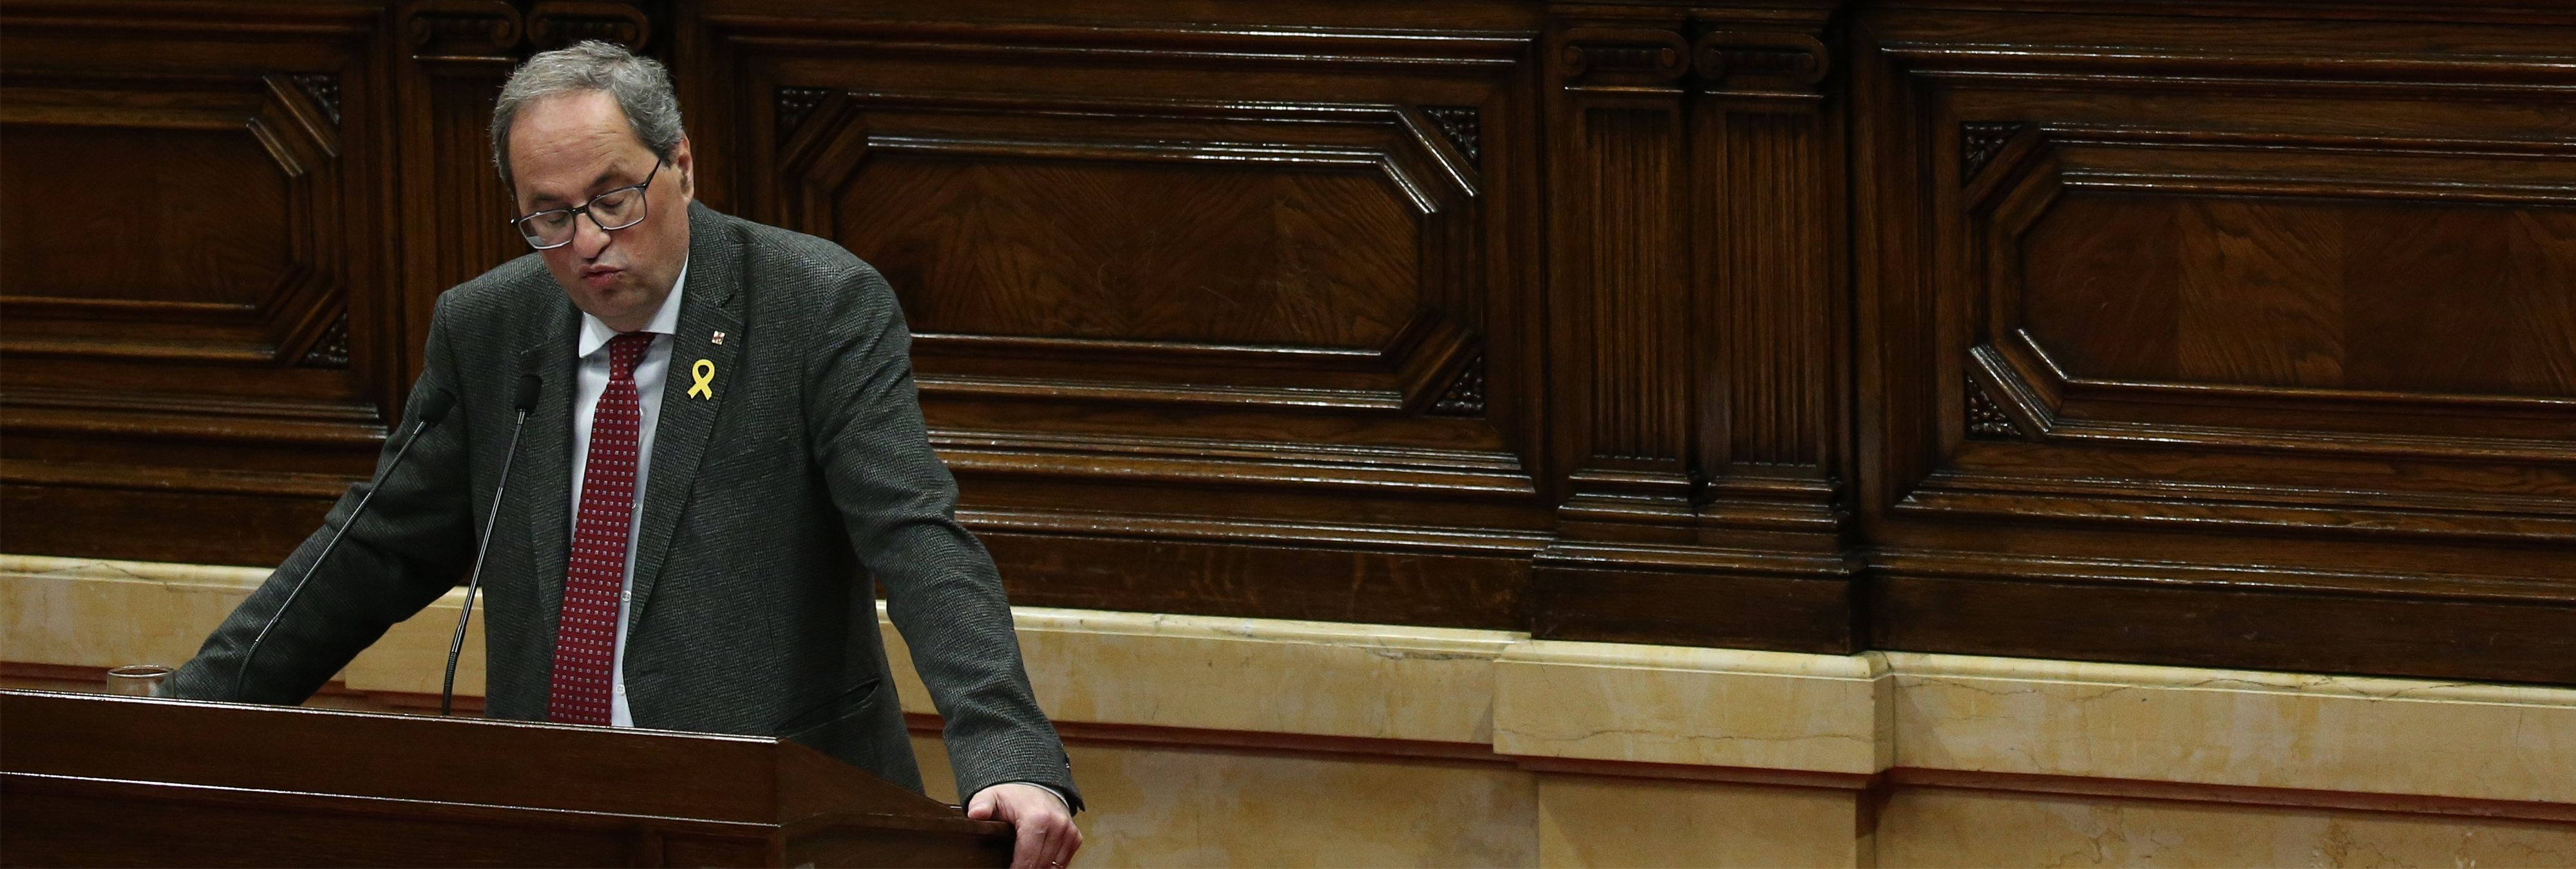 El Parlament aprueba la moción que insta a Quim Torra a convocar elecciones